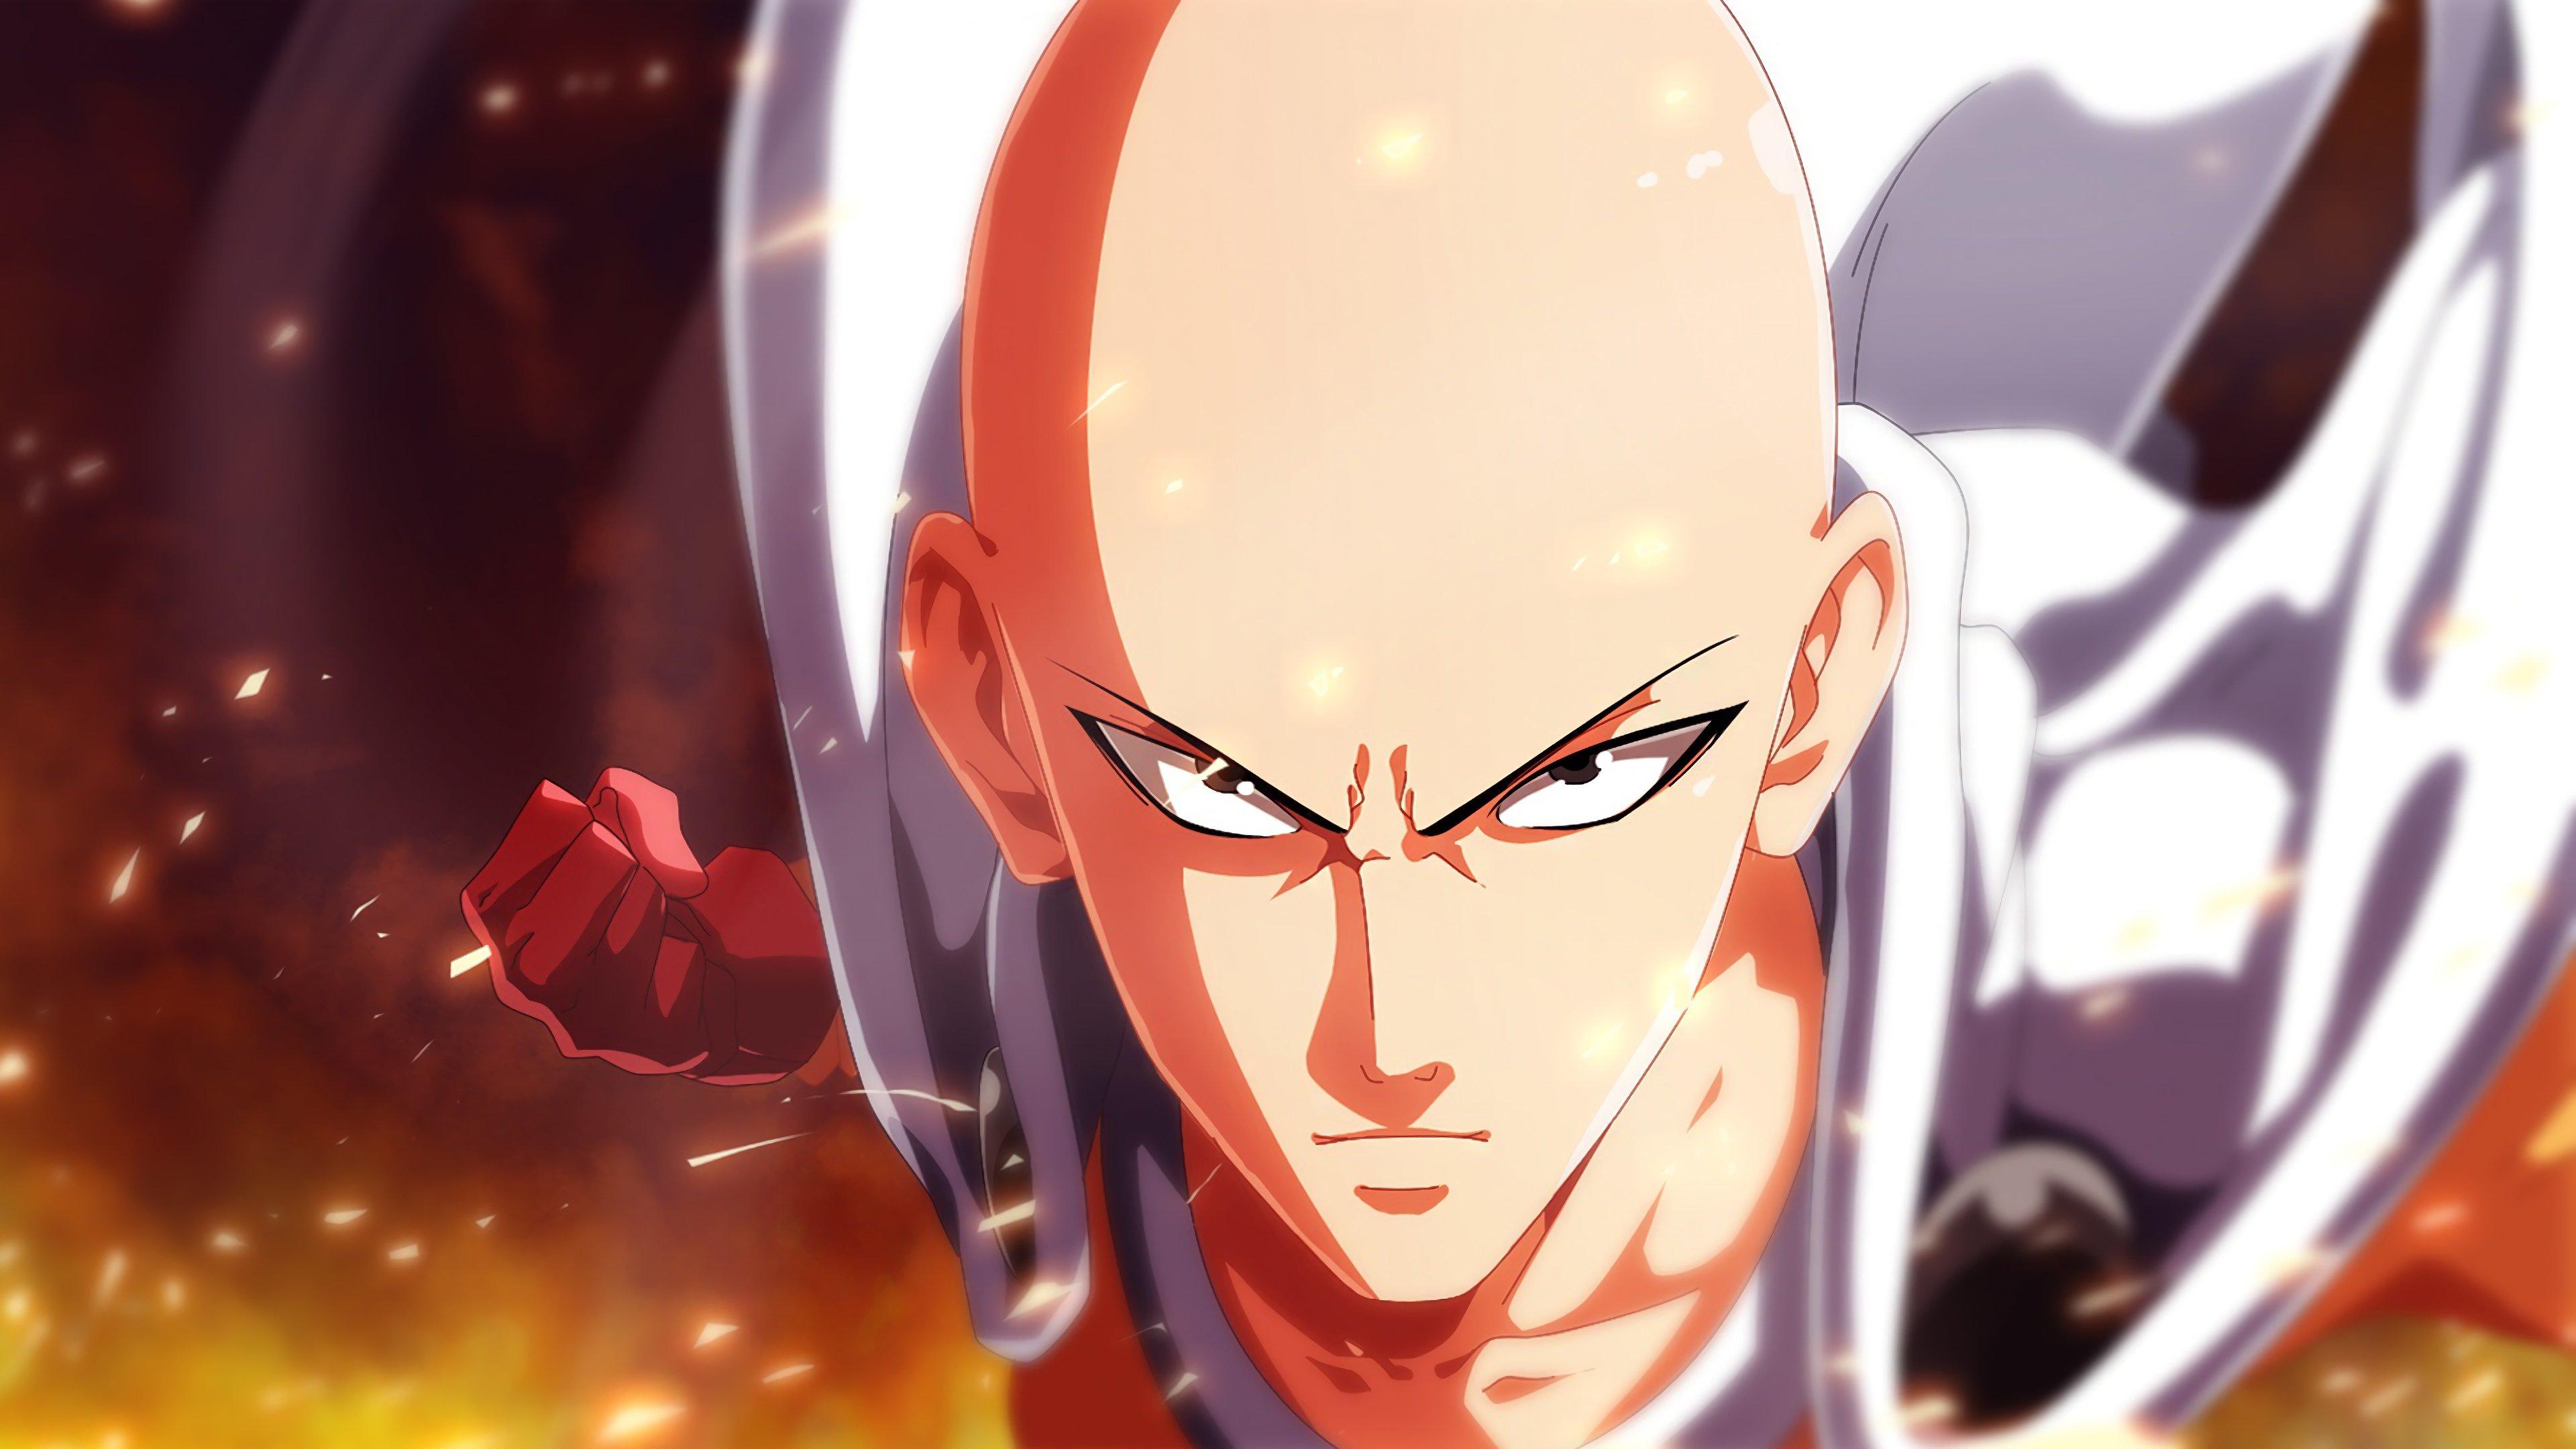 Fondos de pantalla Anime Saitama One Punch Man